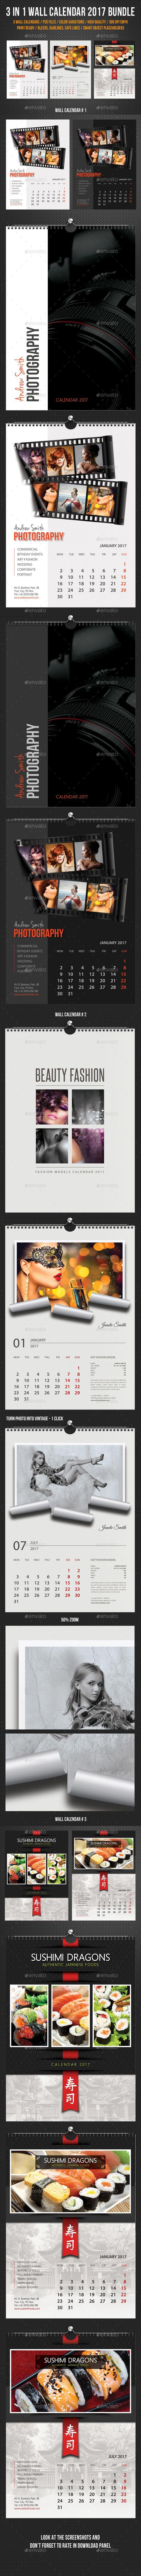 3 in 1 Wall Calendar 2017 Bundle V13 - Calendars Stationery